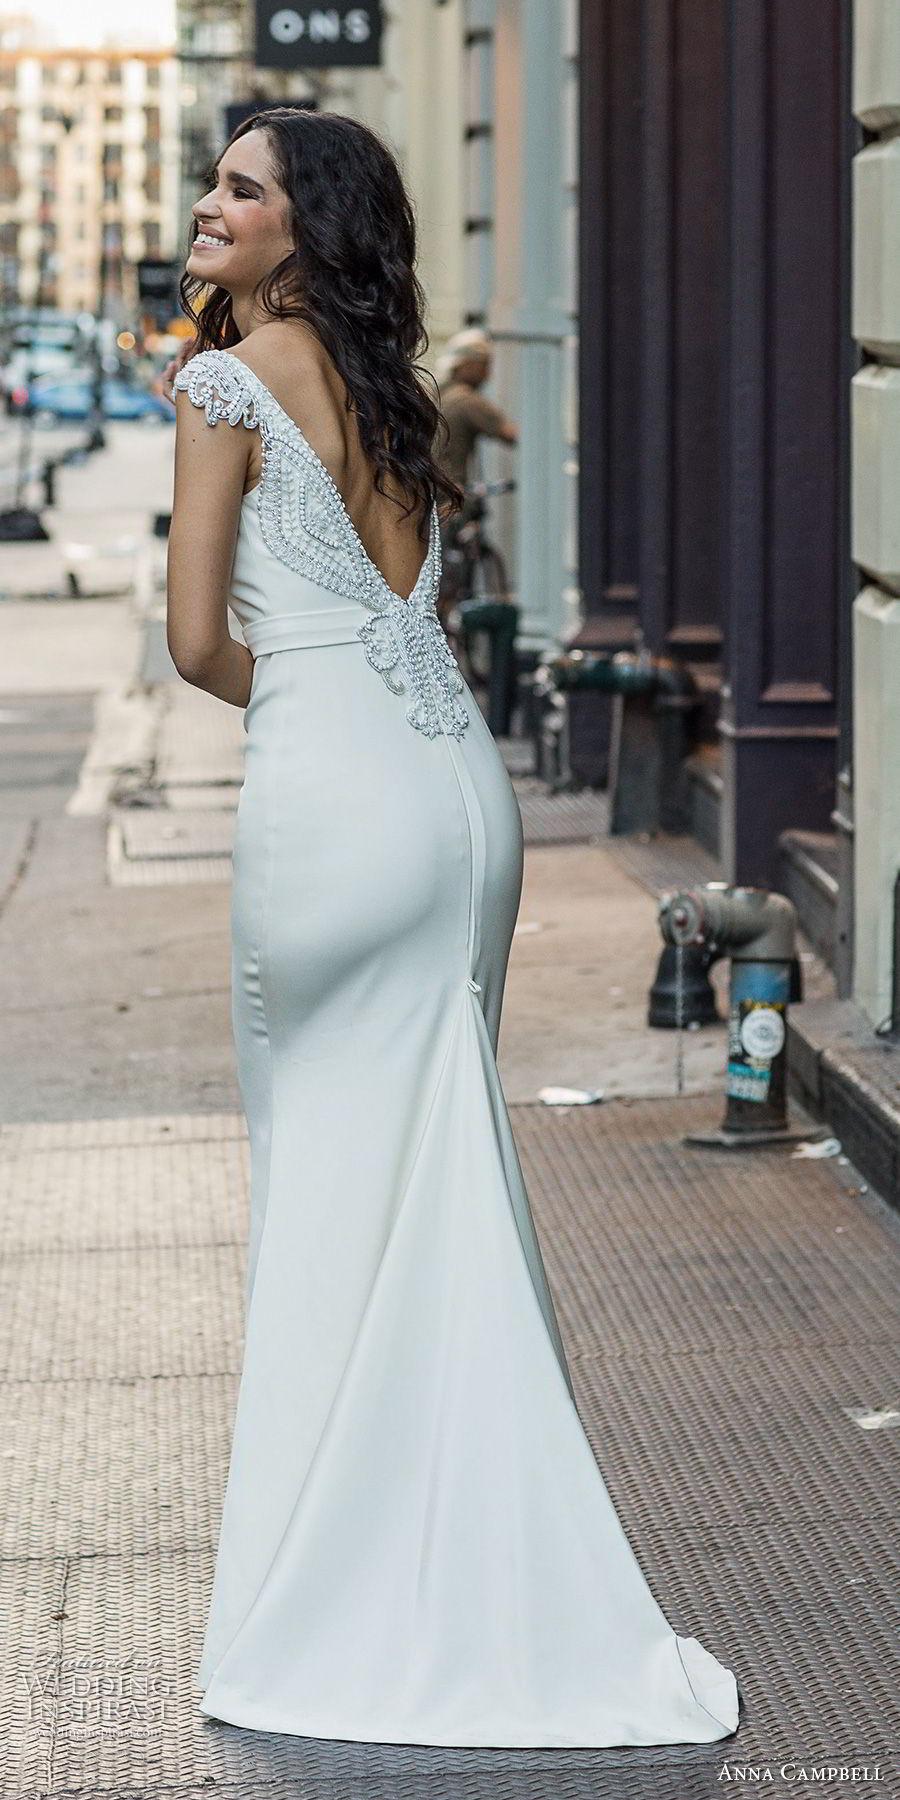 Anna Campbell Fall 2018 Wedding Dresses - crazyforus